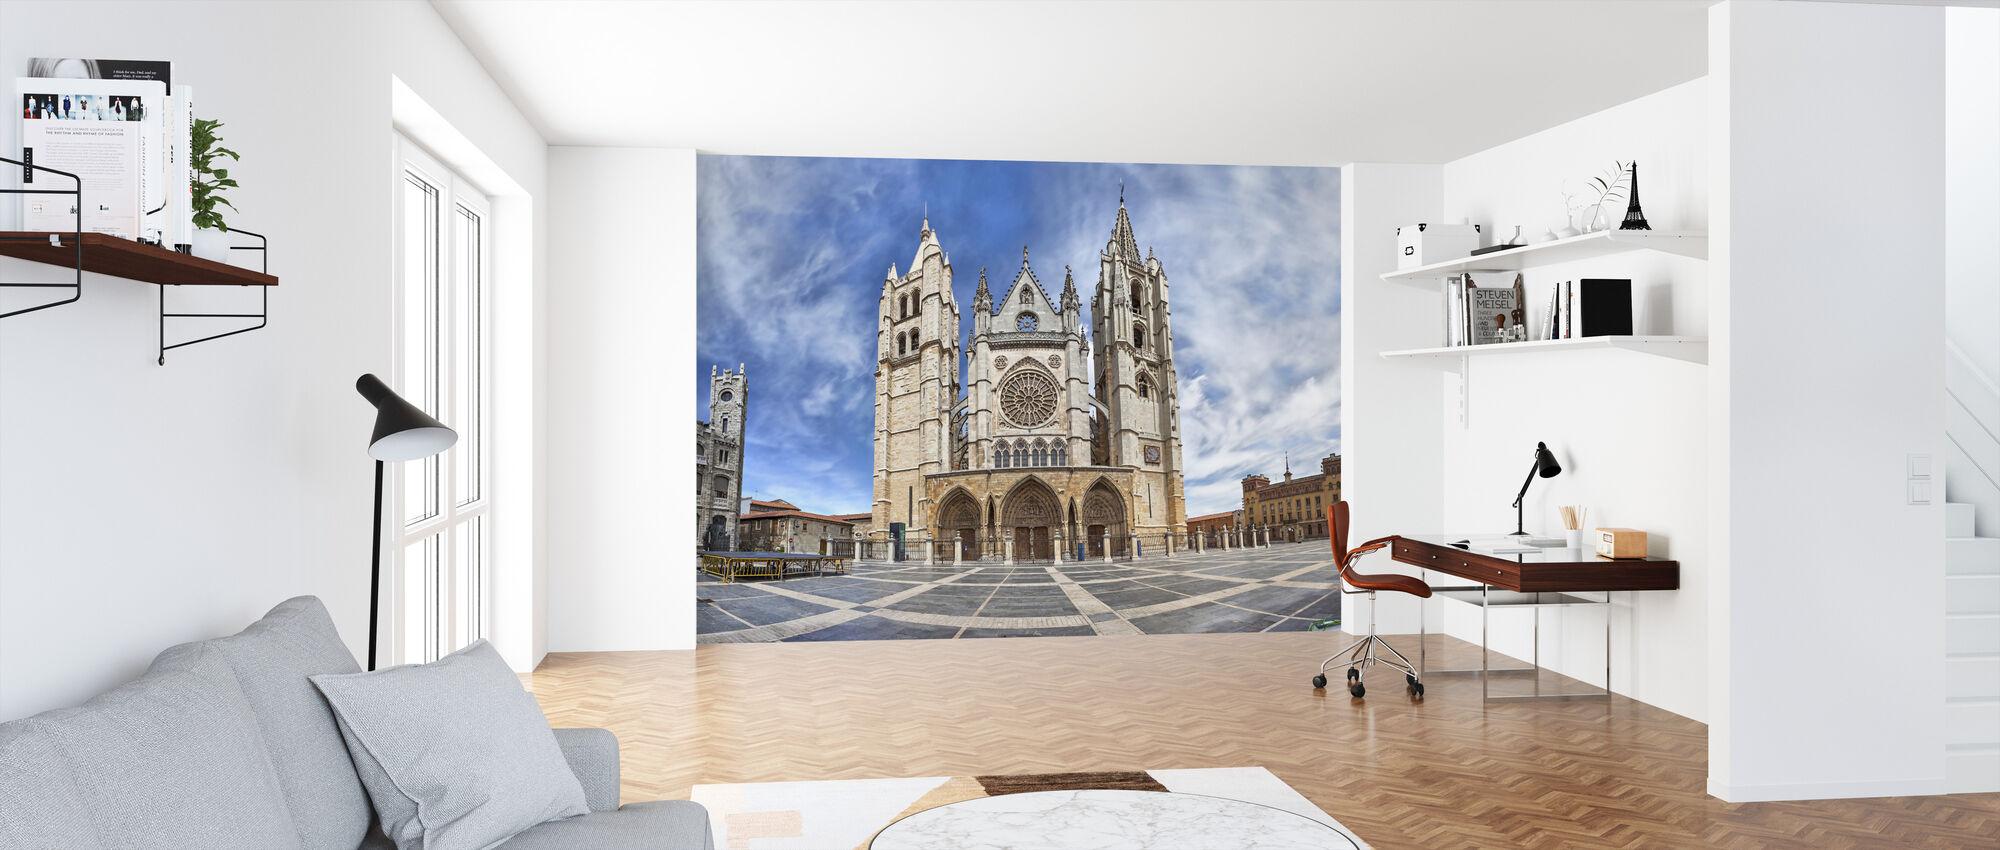 Plaza de Regla and Leon Cathedral - Wallpaper - Office